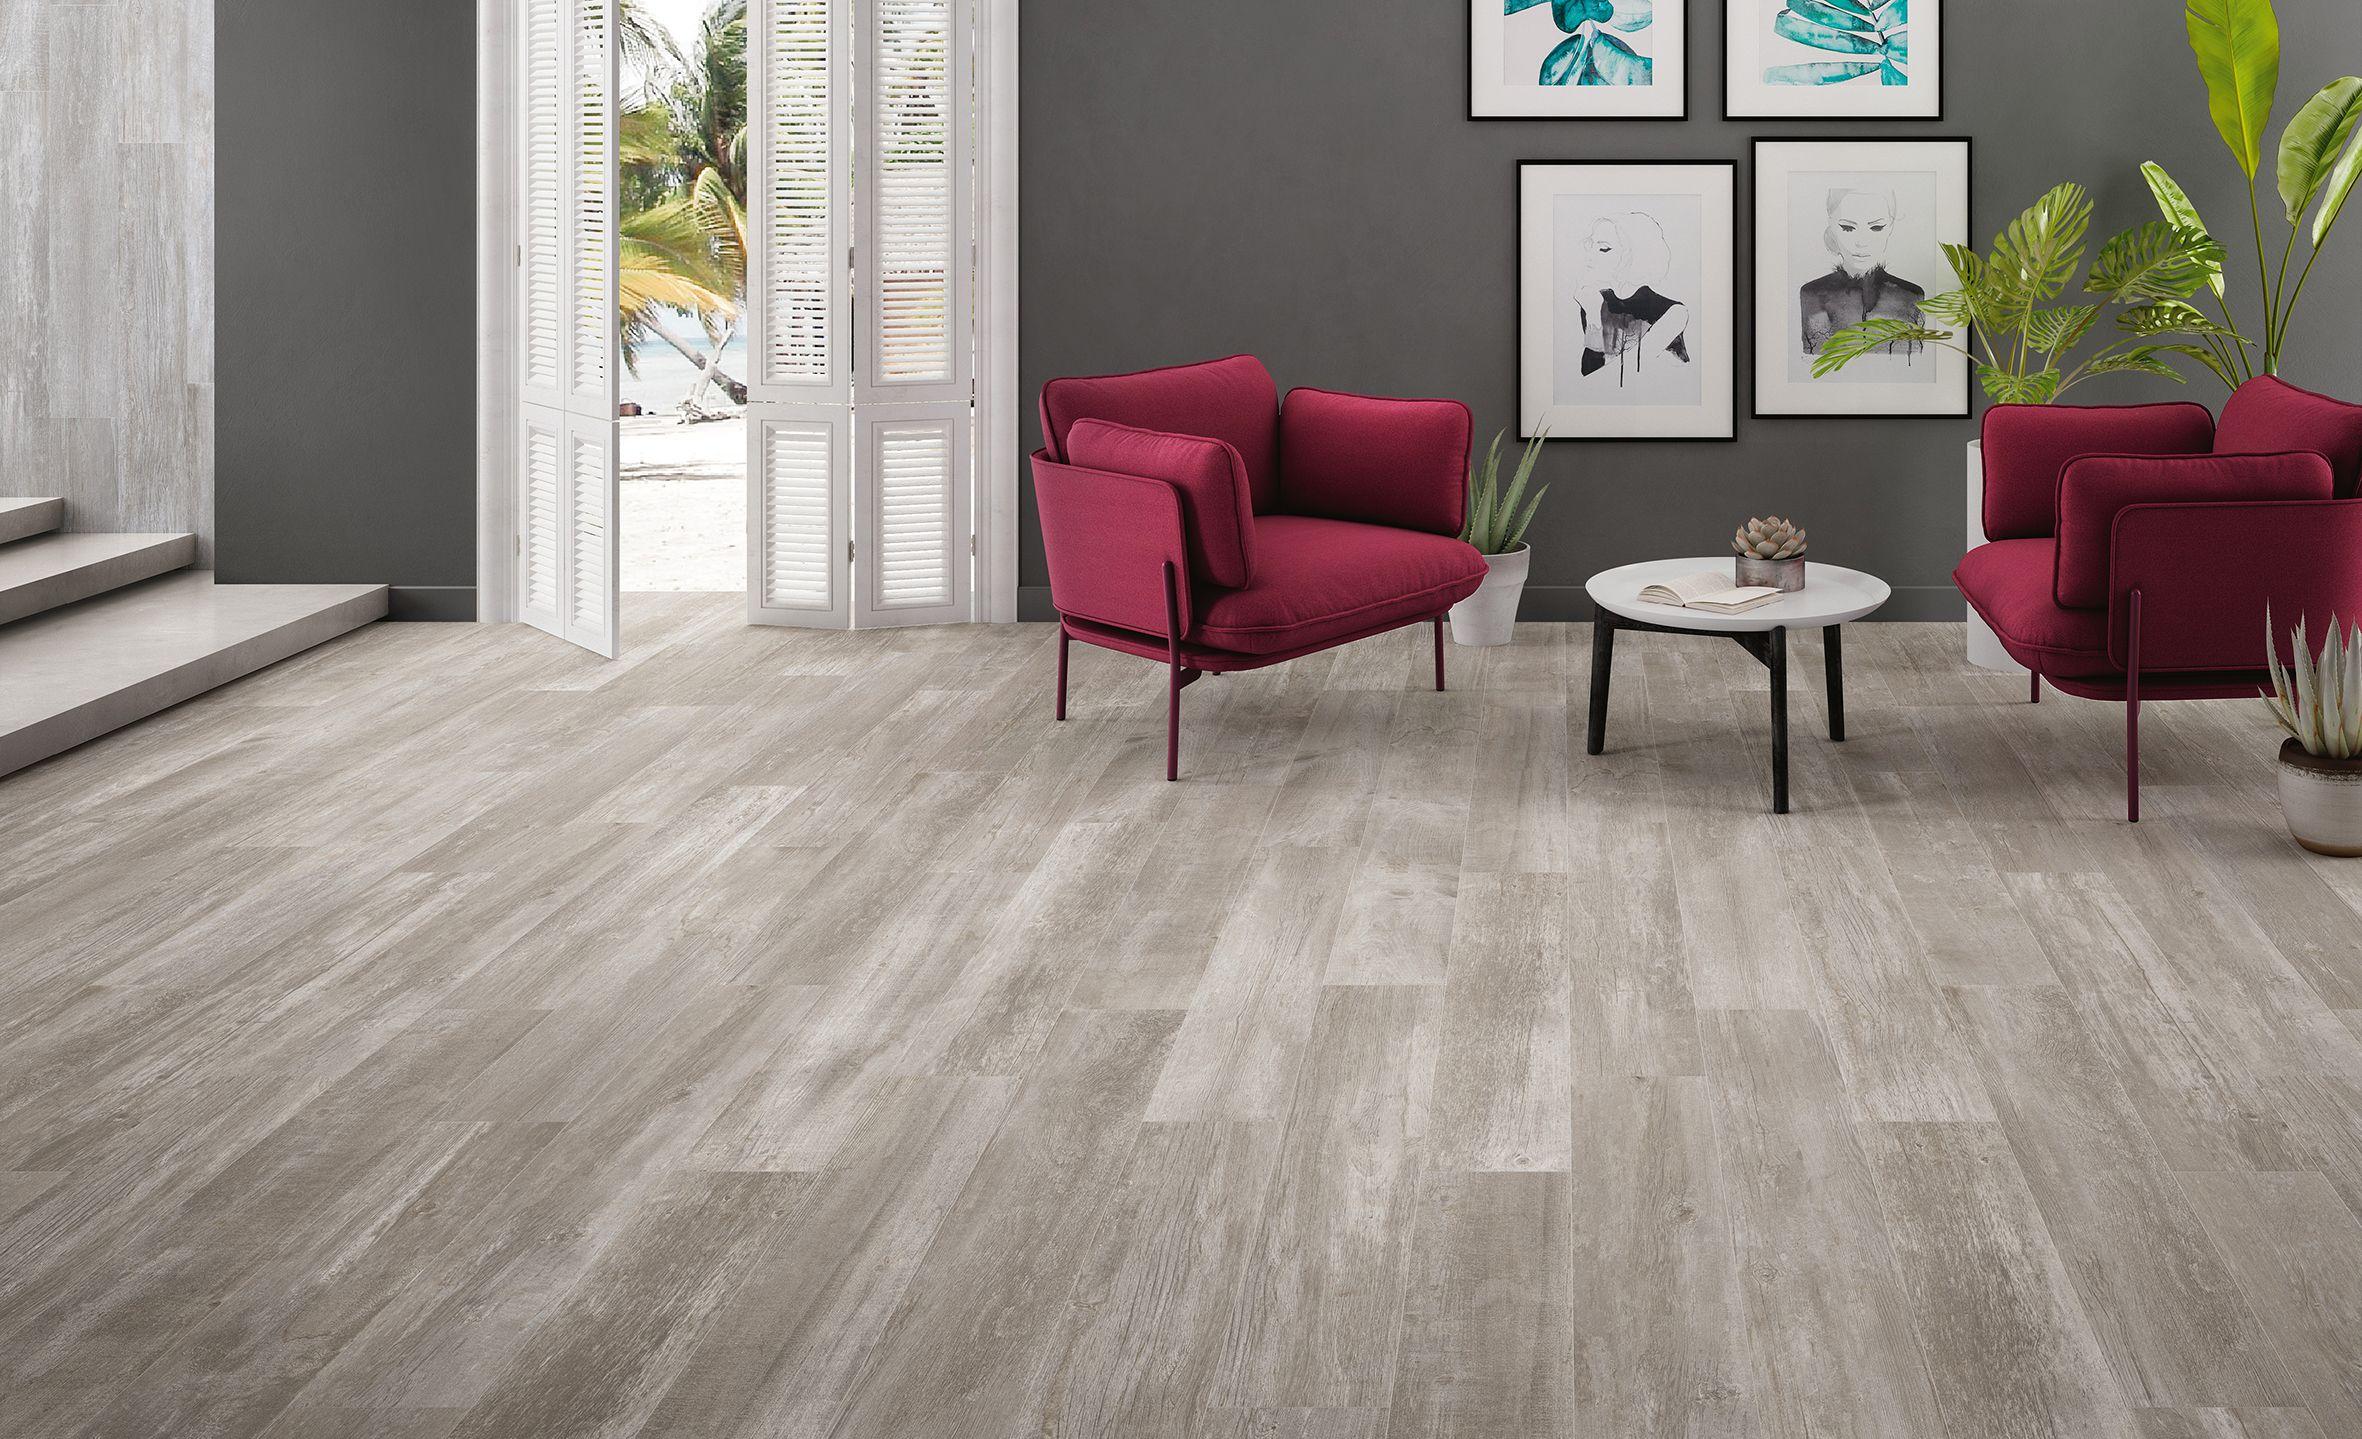 "Cabane Sand 8""x48"" Wood plank tile, Tiles for sale, Wood"